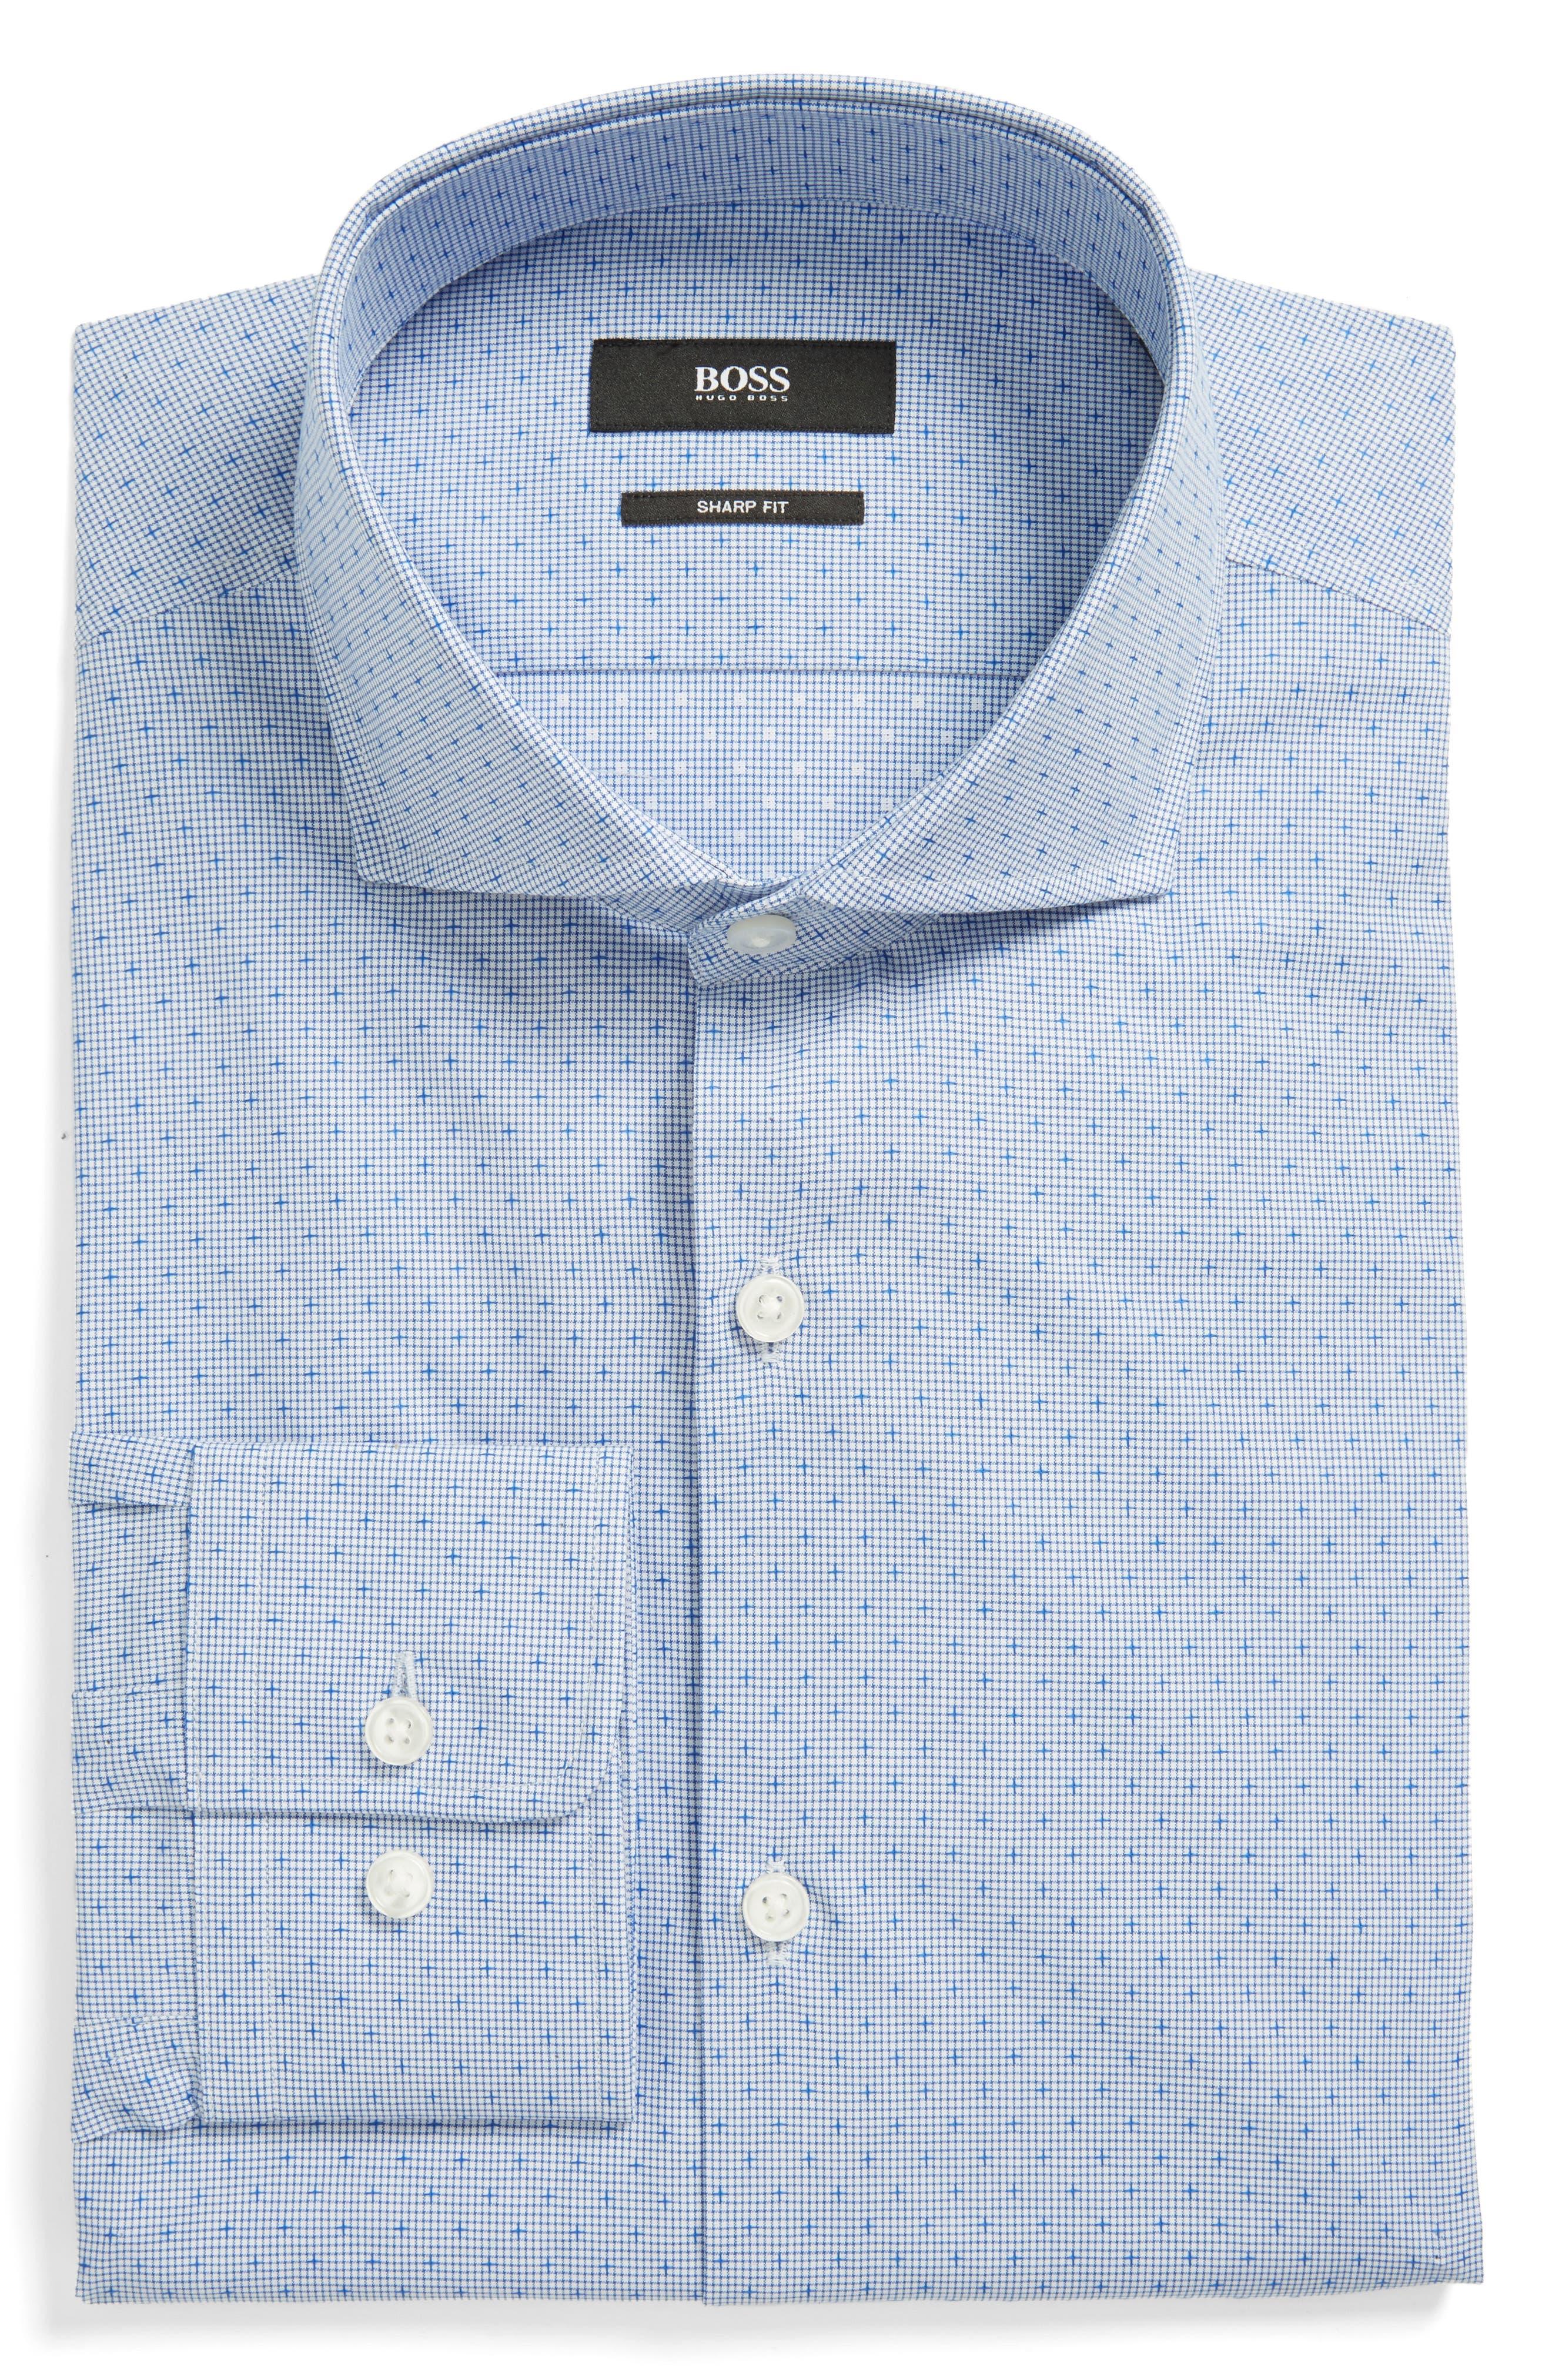 Mark Sharp Fit Dobby Dress Shirt,                             Main thumbnail 1, color,                             420